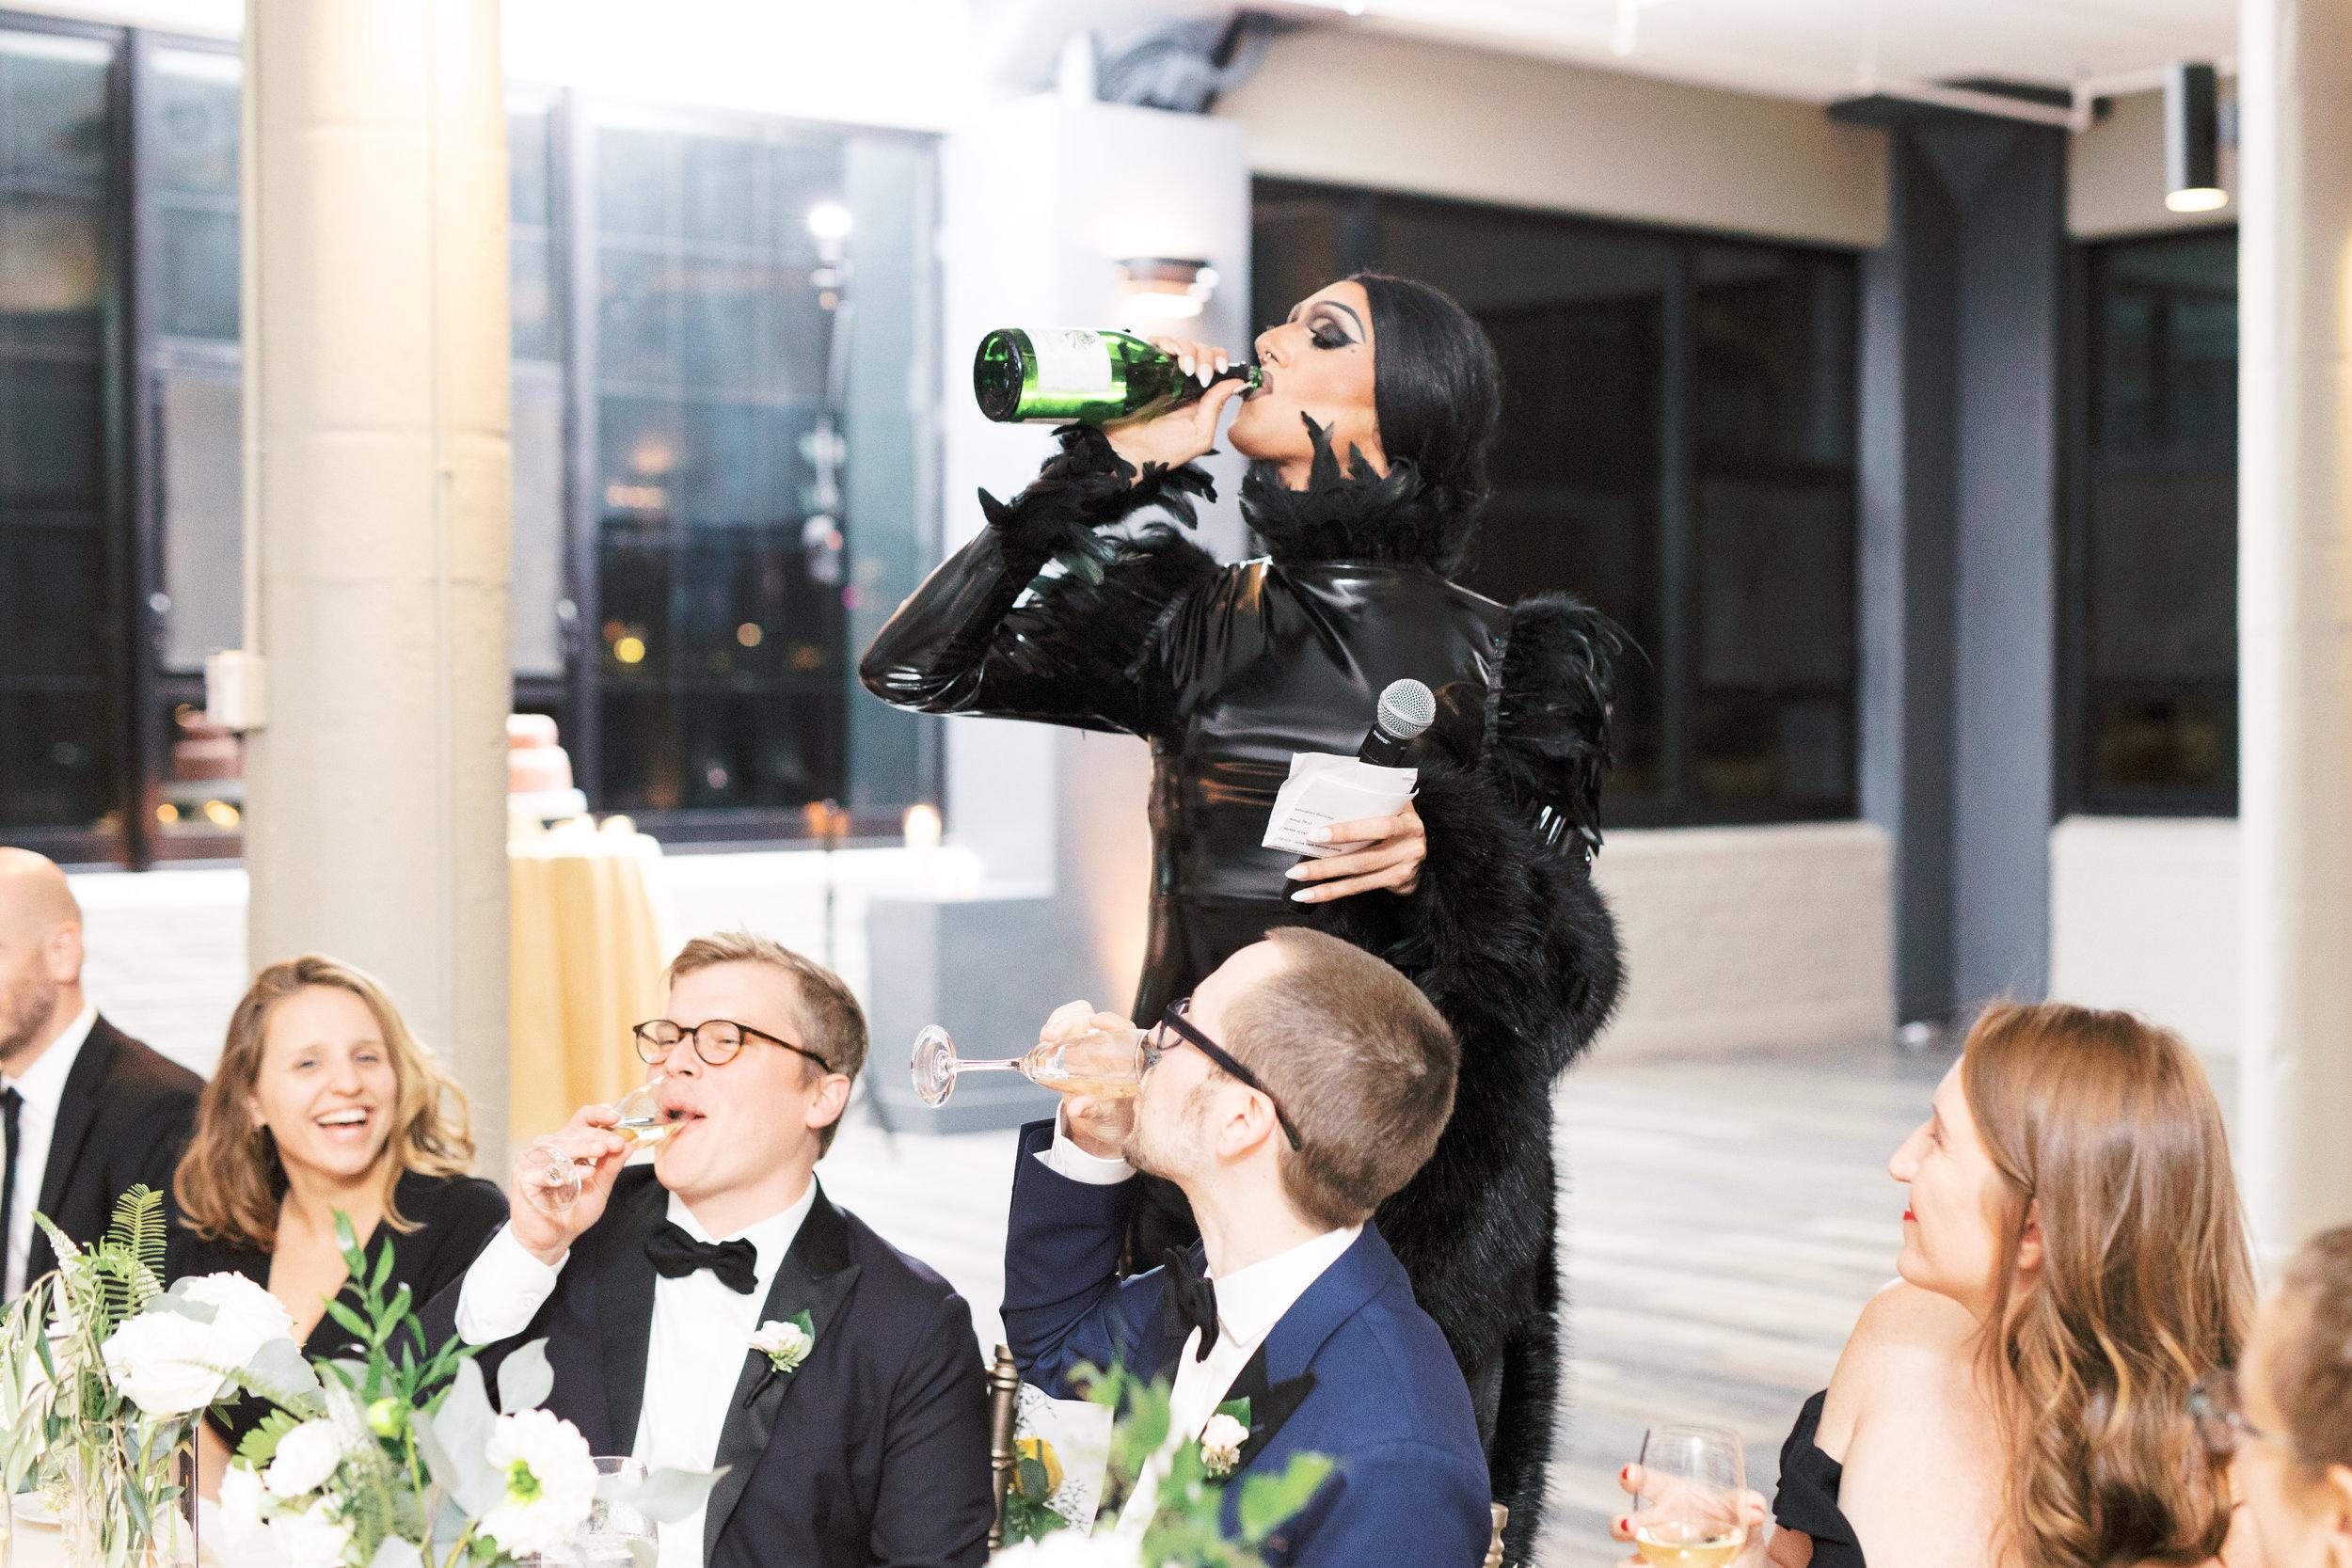 drag queen toast at a wedding reception in Philadelphia